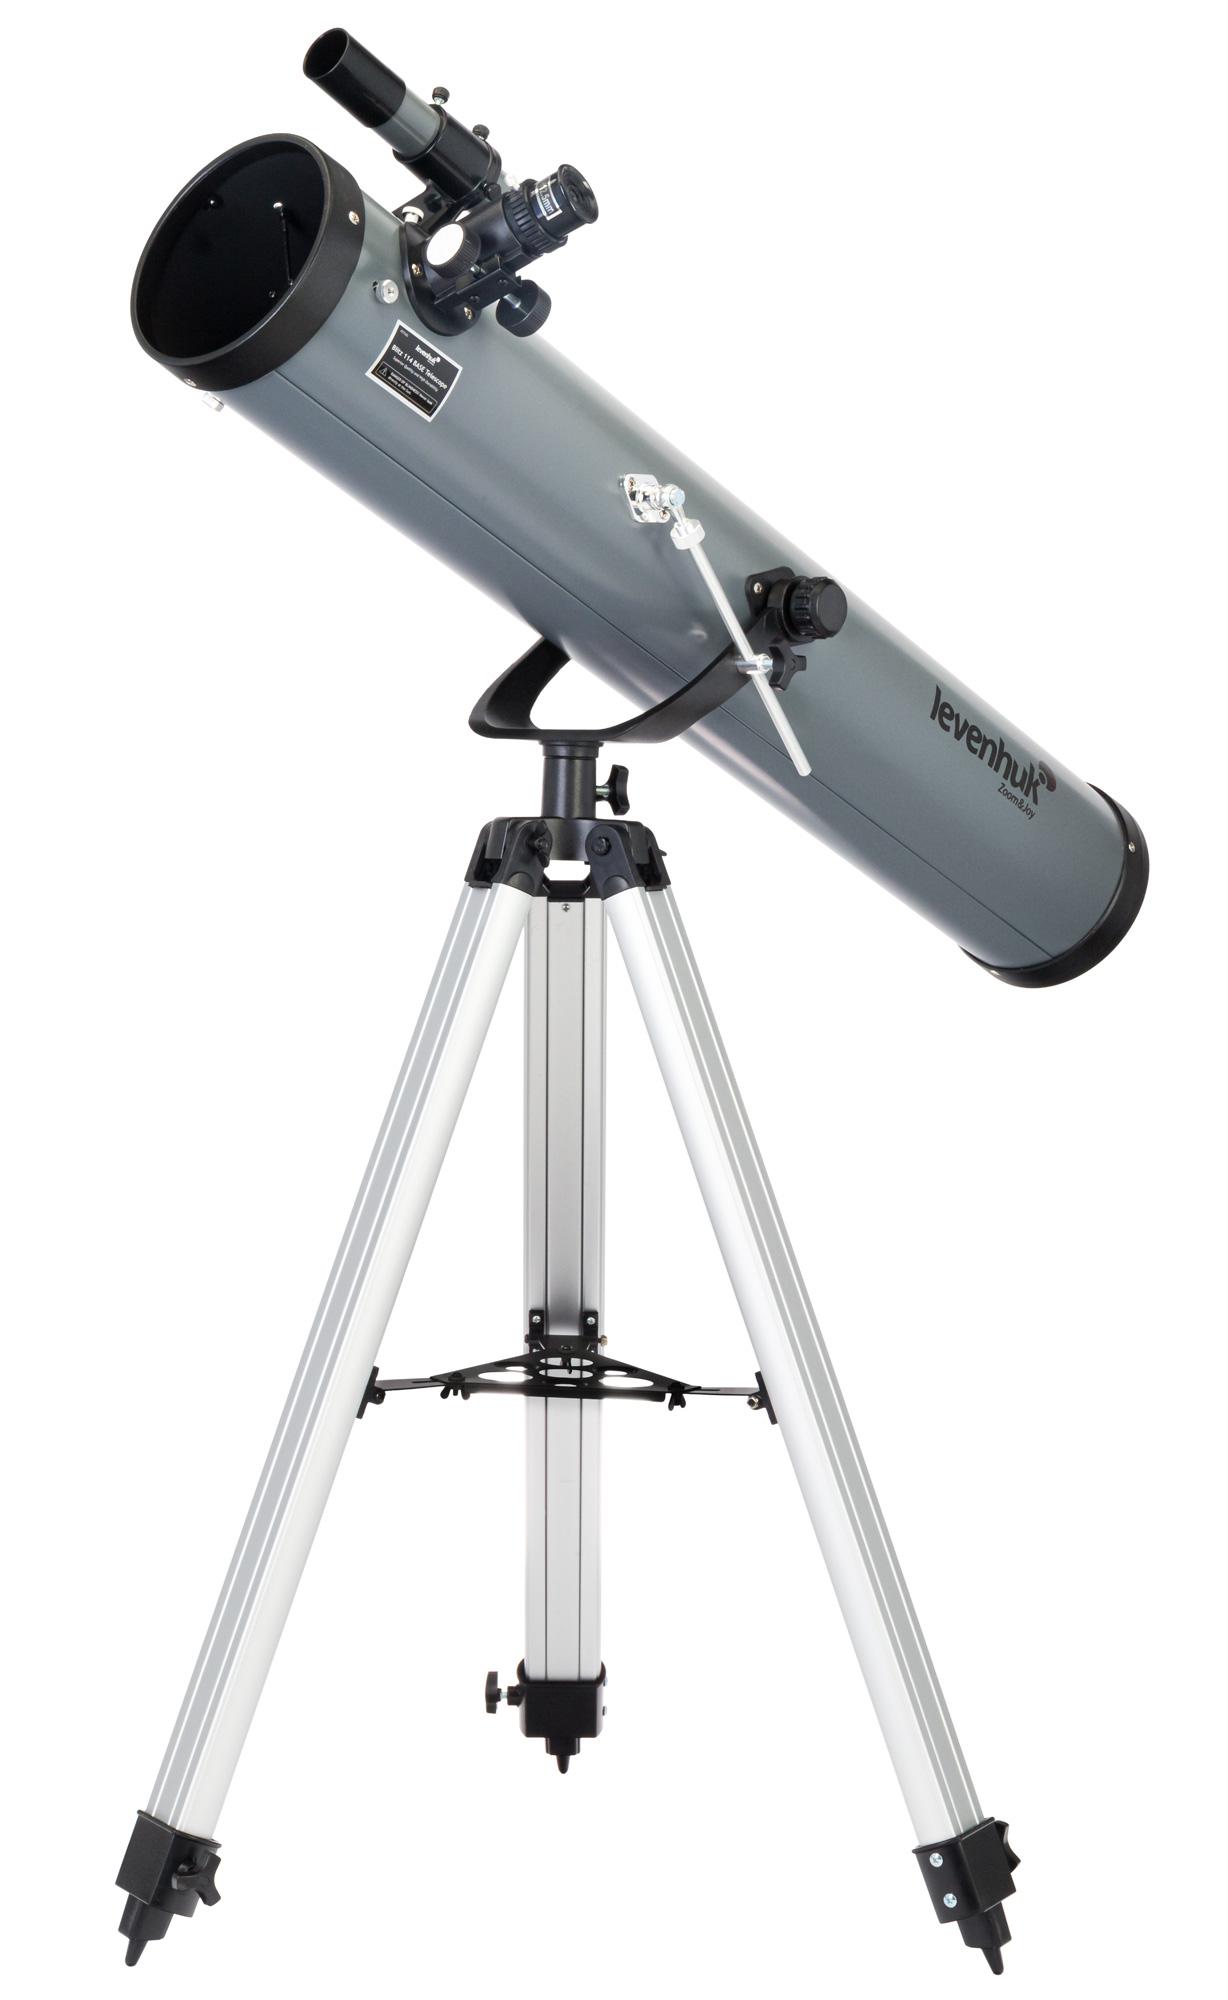 Картинка для Телескоп Levenhuk (Левенгук) Blitz 114 BASE